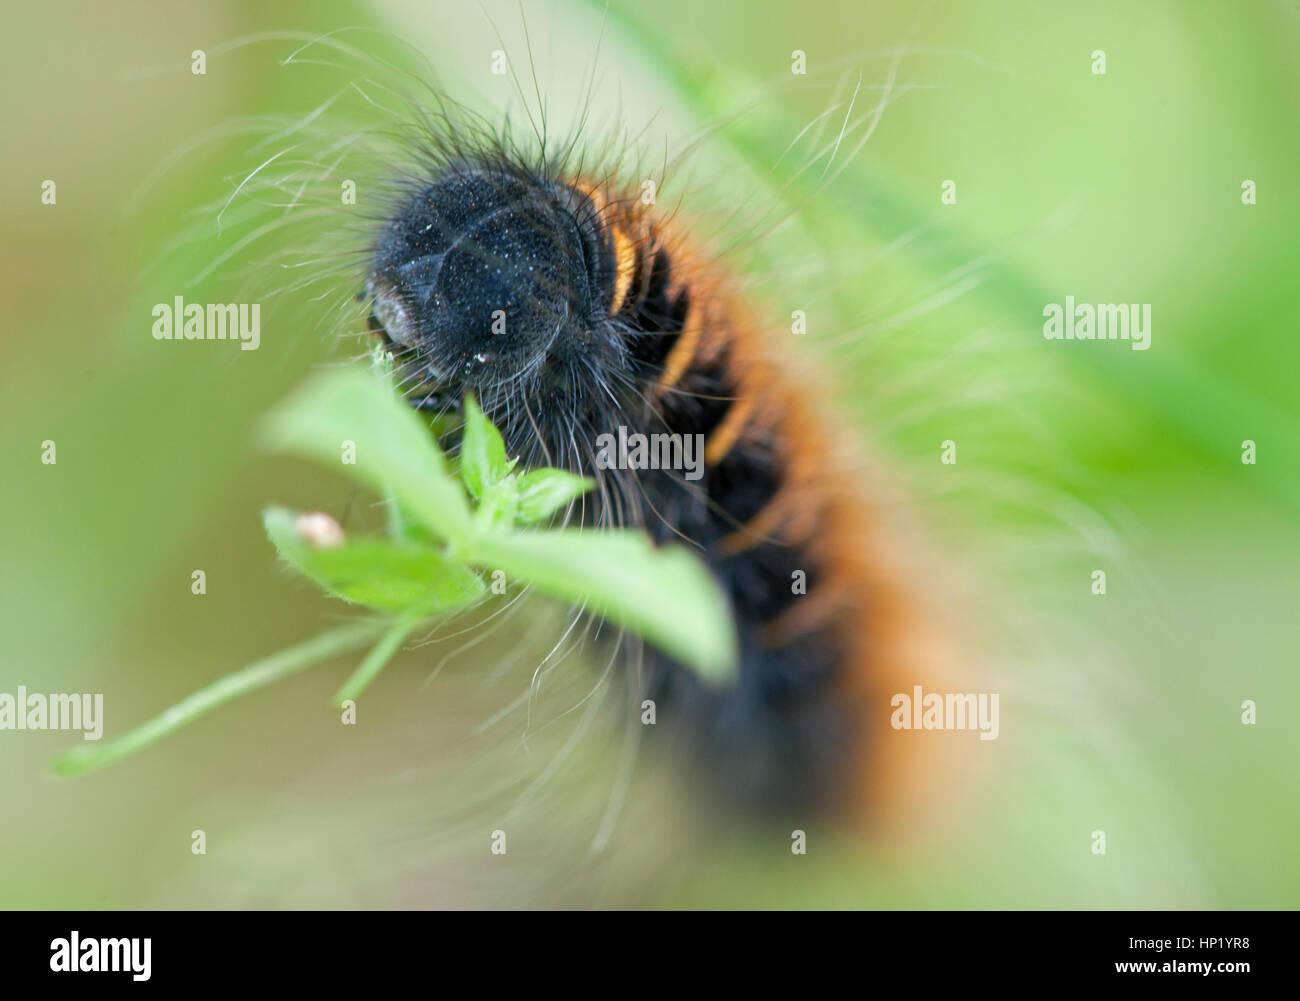 closeup of a caterpillar Macrothylacia rubi in ist natural background - Stock Image